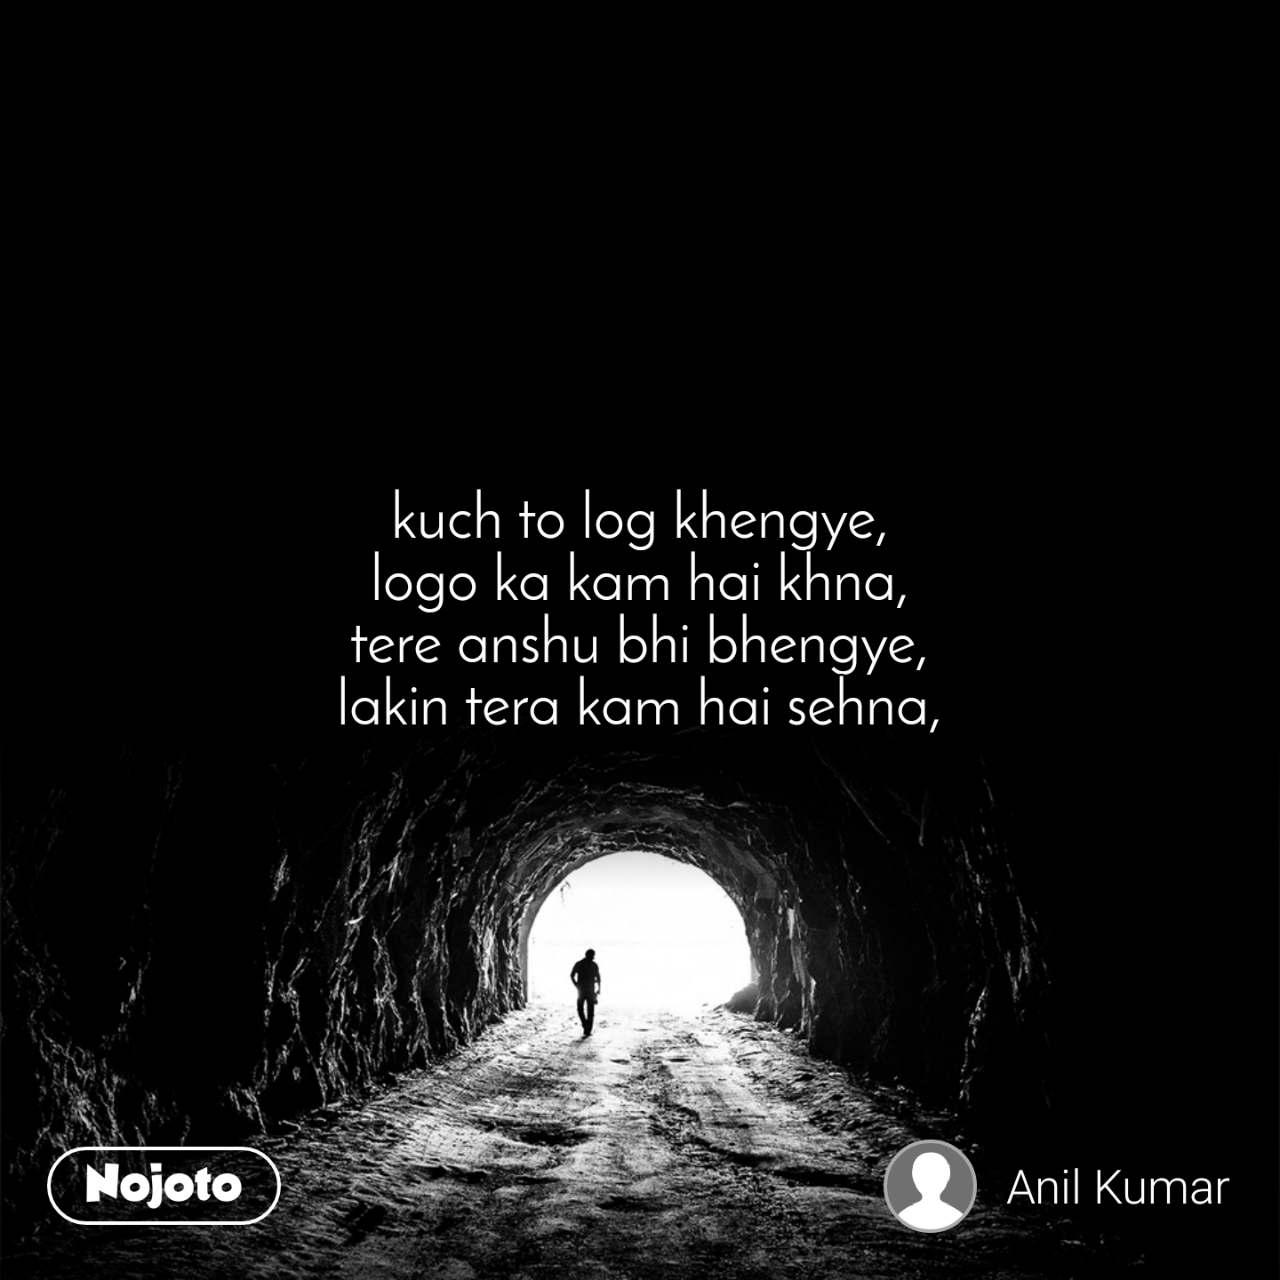 Tunnel kuch to log khengye, logo ka kam hai khna, tere anshu bhi bhengye, lakin tera kam hai sehna,